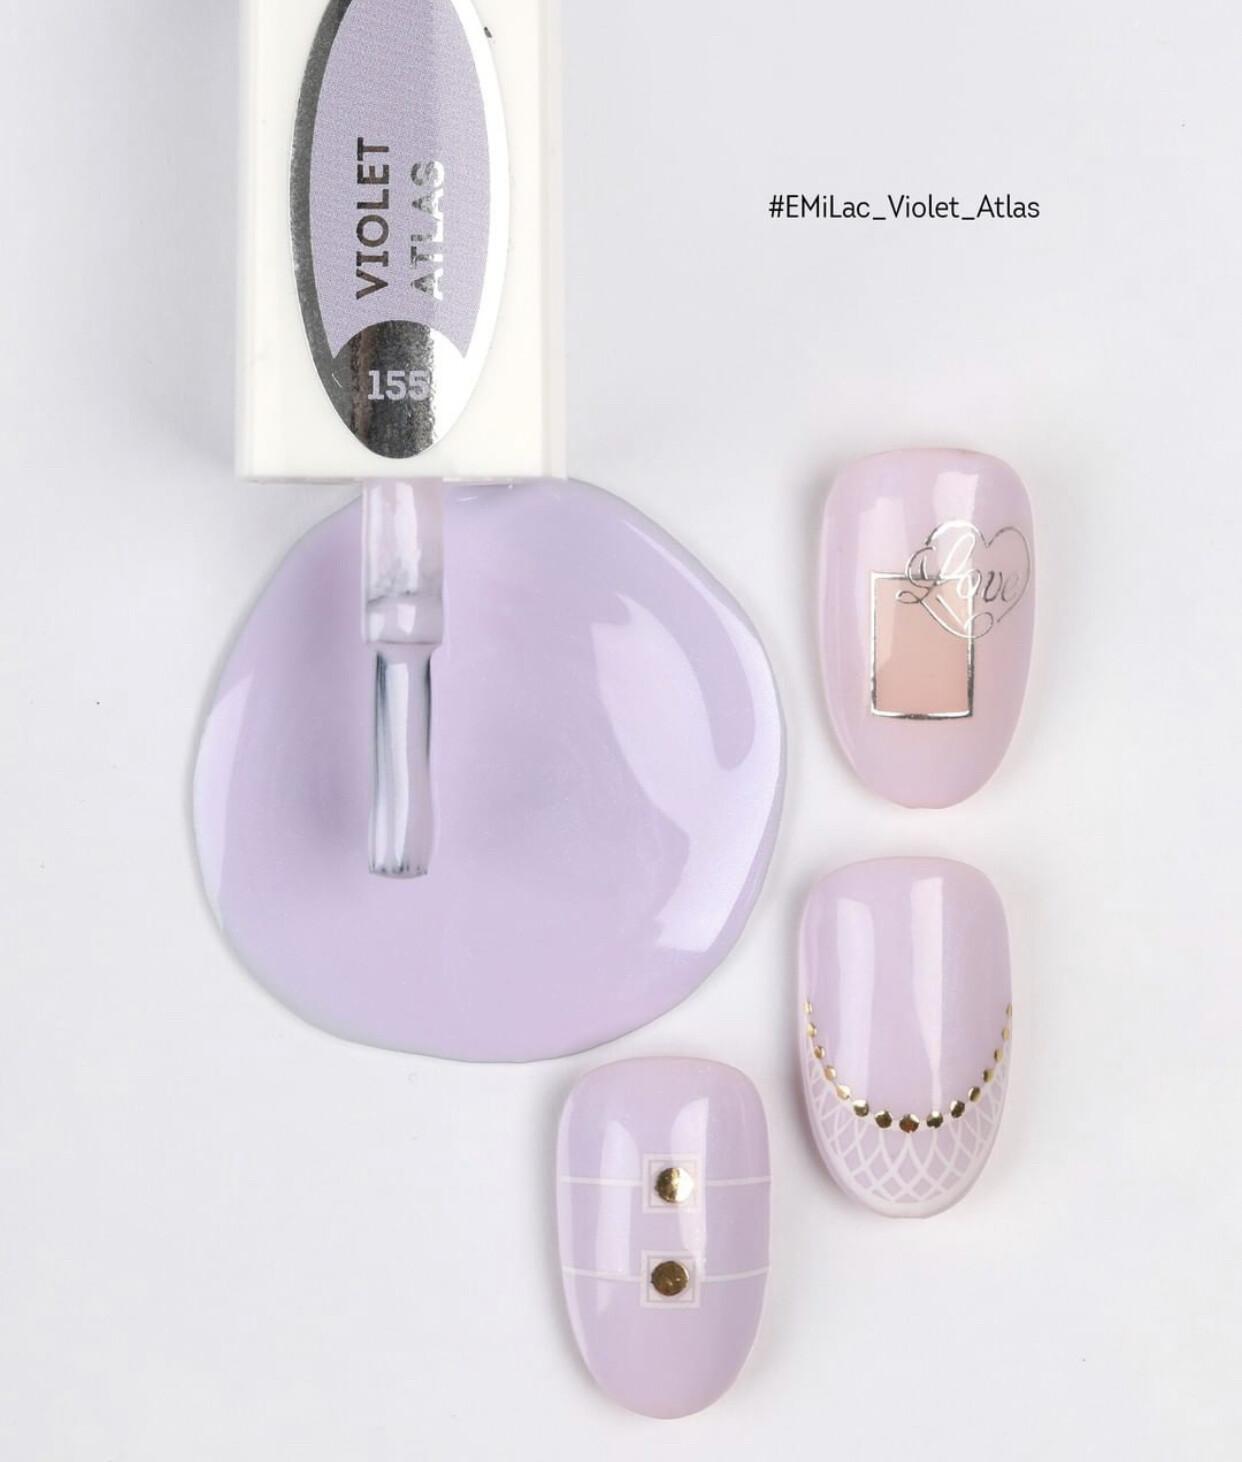 E.MiLac #155 Violet Atlas — mesmerizing violet shade with a delicate shine